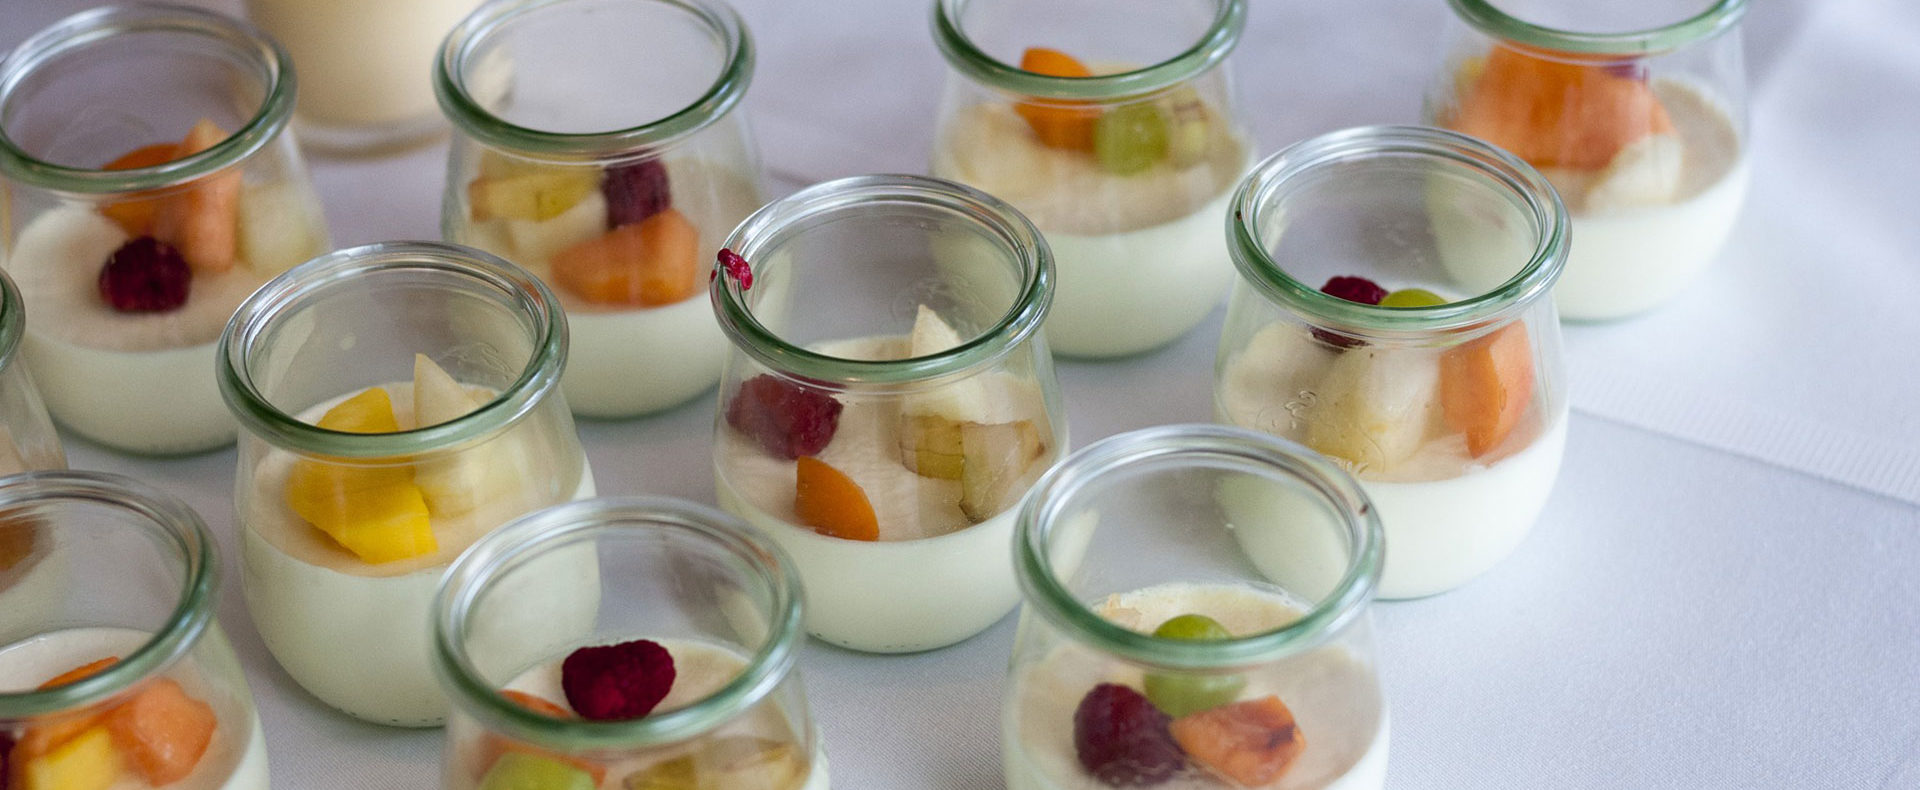 Catering / Partyservice - Joghurt-Dessert mit Früchten am Buffet